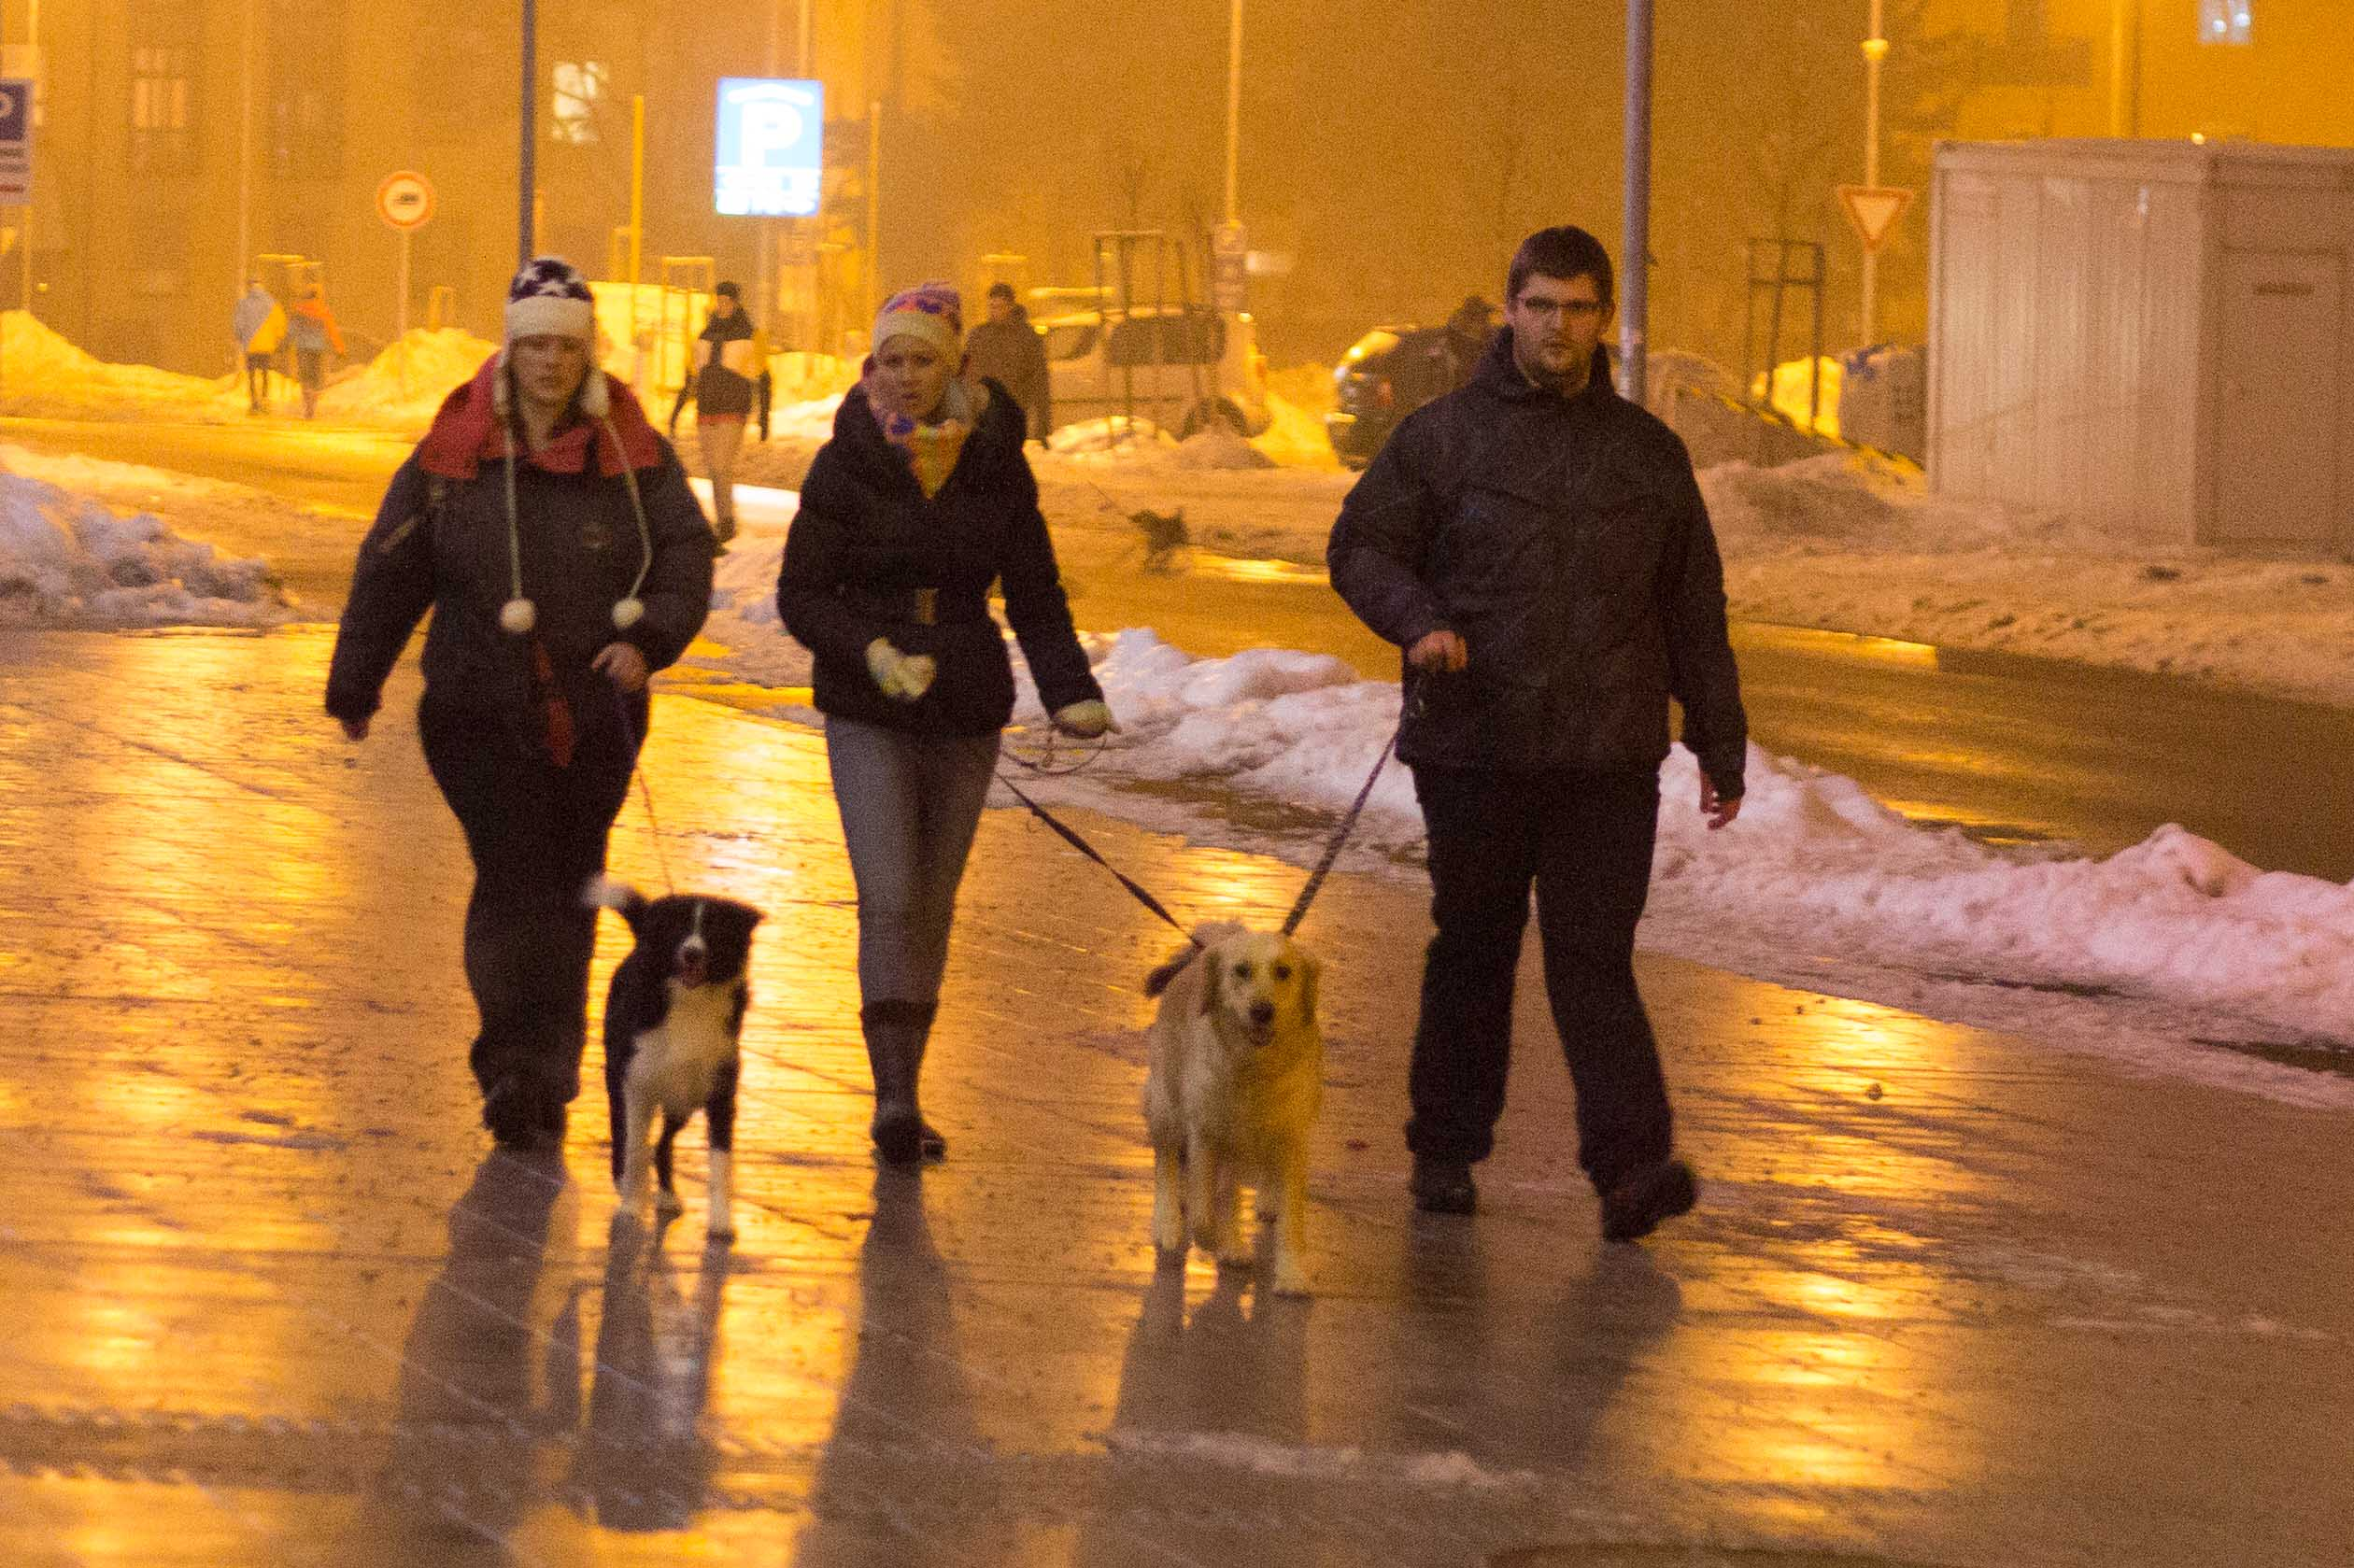 vianocna-prechadzka-mestom-2012-zvolen-1